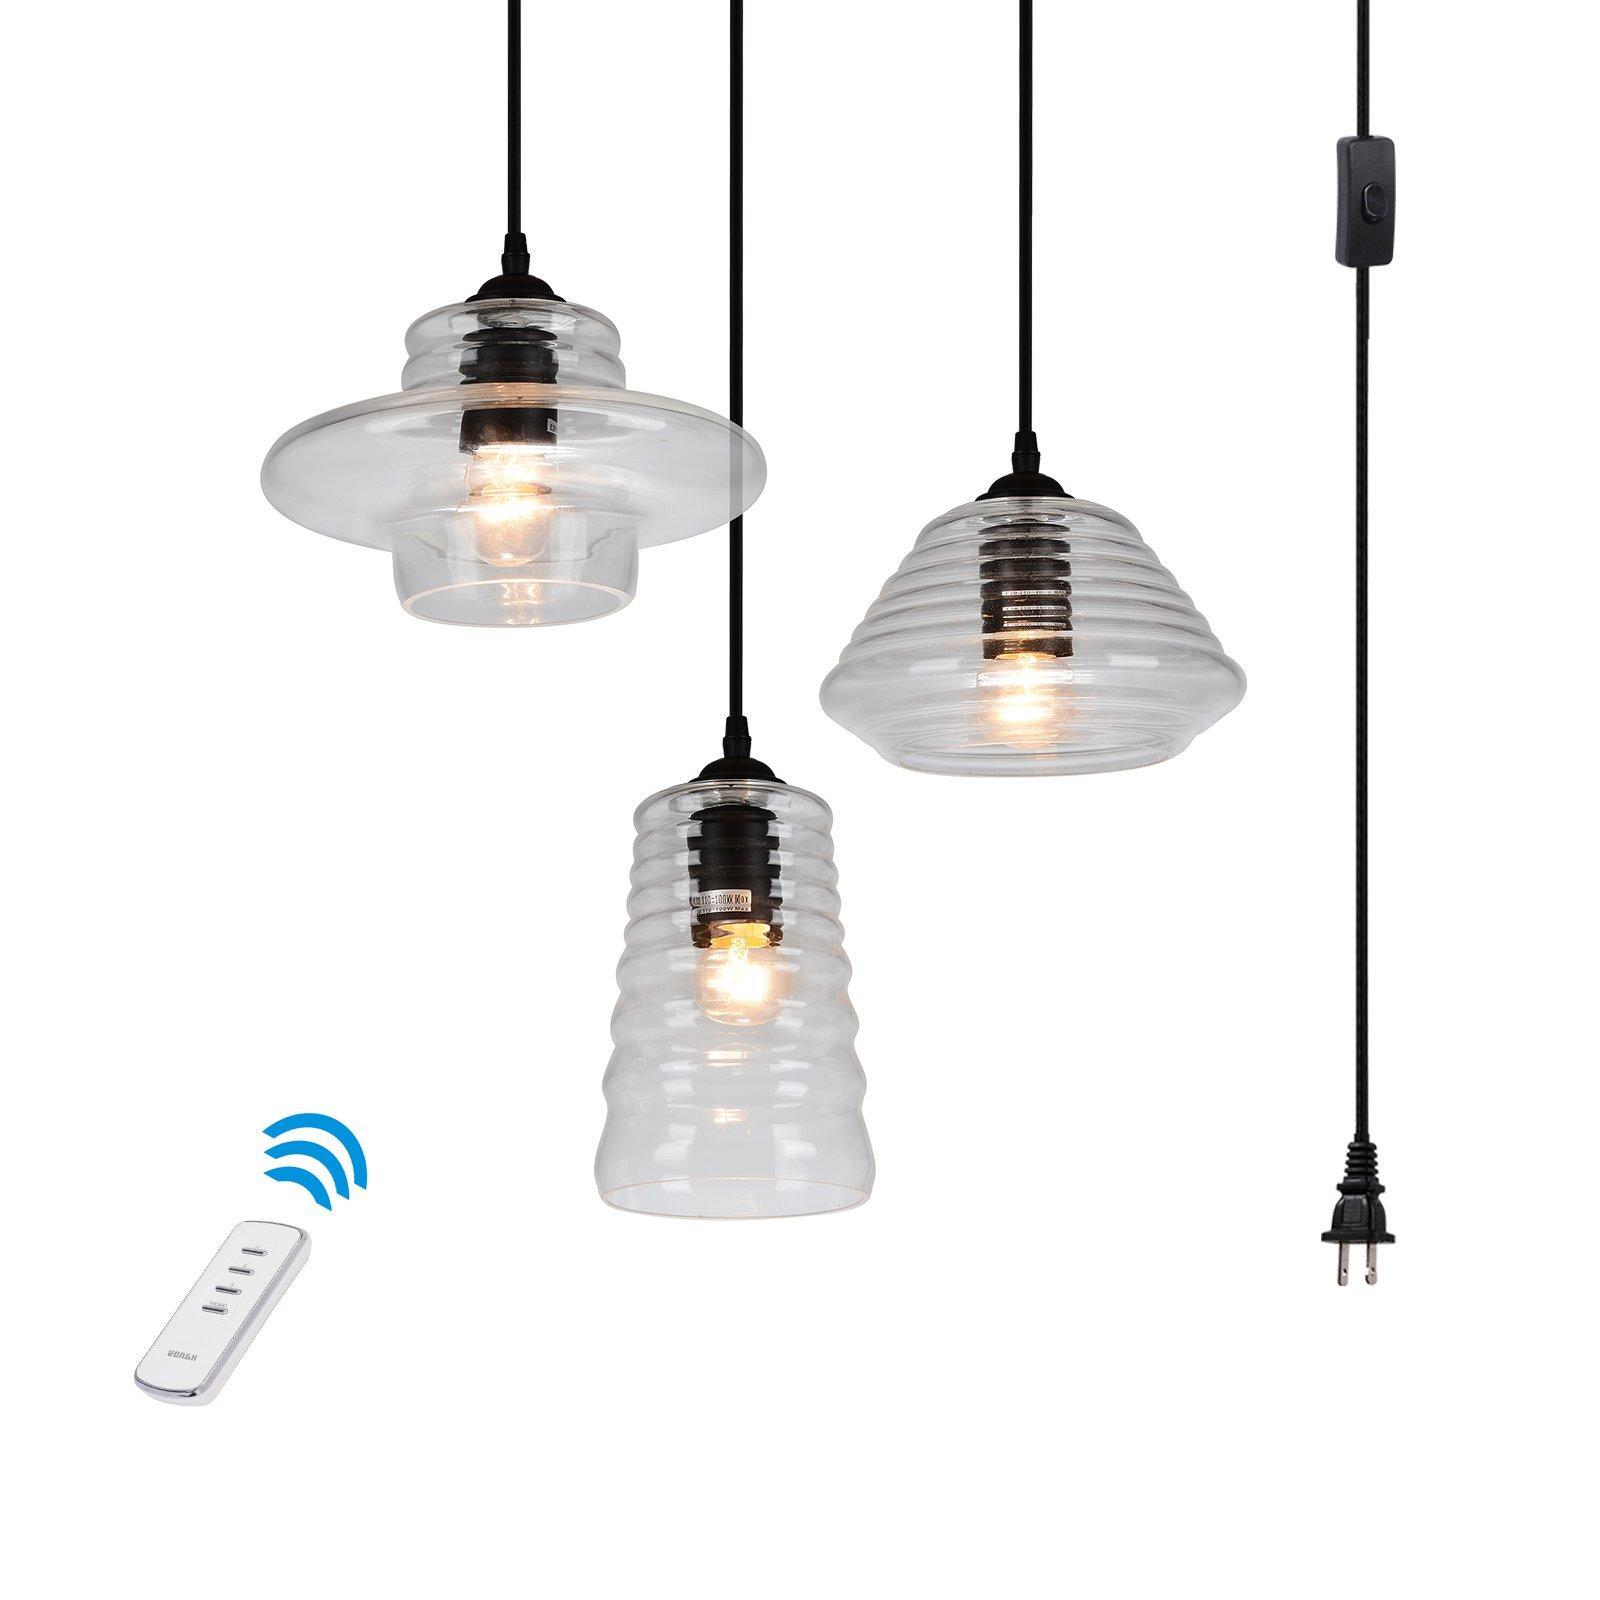 3 light portable hanging plug in vintage pendant black swag hooks 3 light portable hanging plug in vintage pendant black swag hooks ceiling lamp aloadofball Choice Image